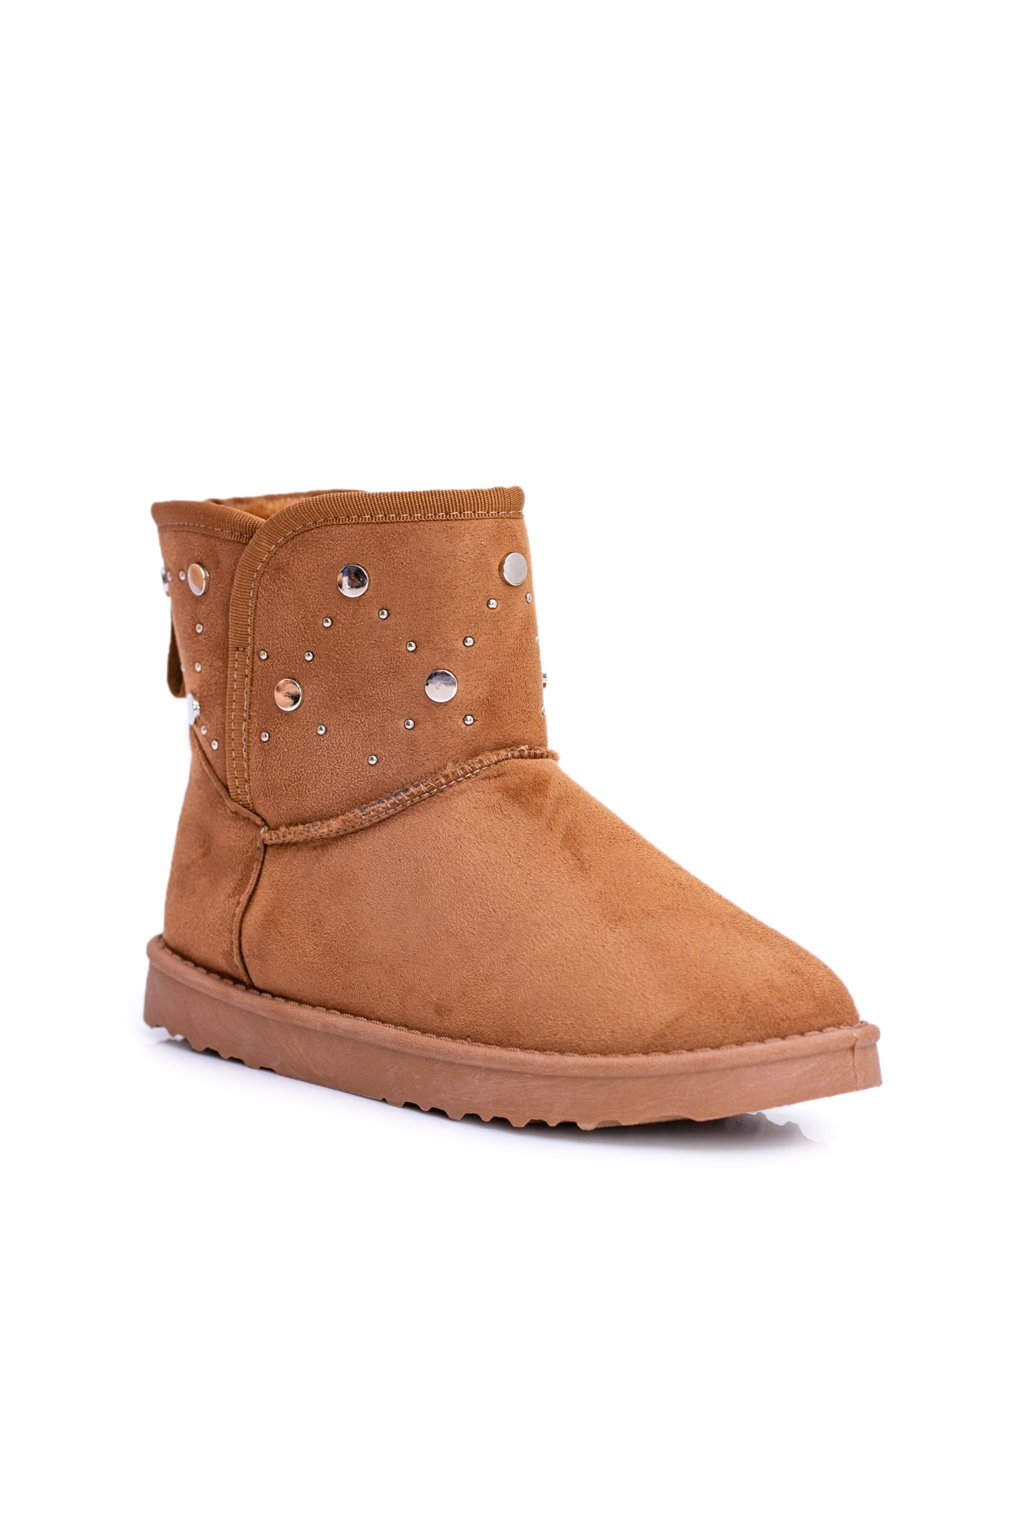 Dámske snehule farba hnedá kód obuvi C607 CAMEL